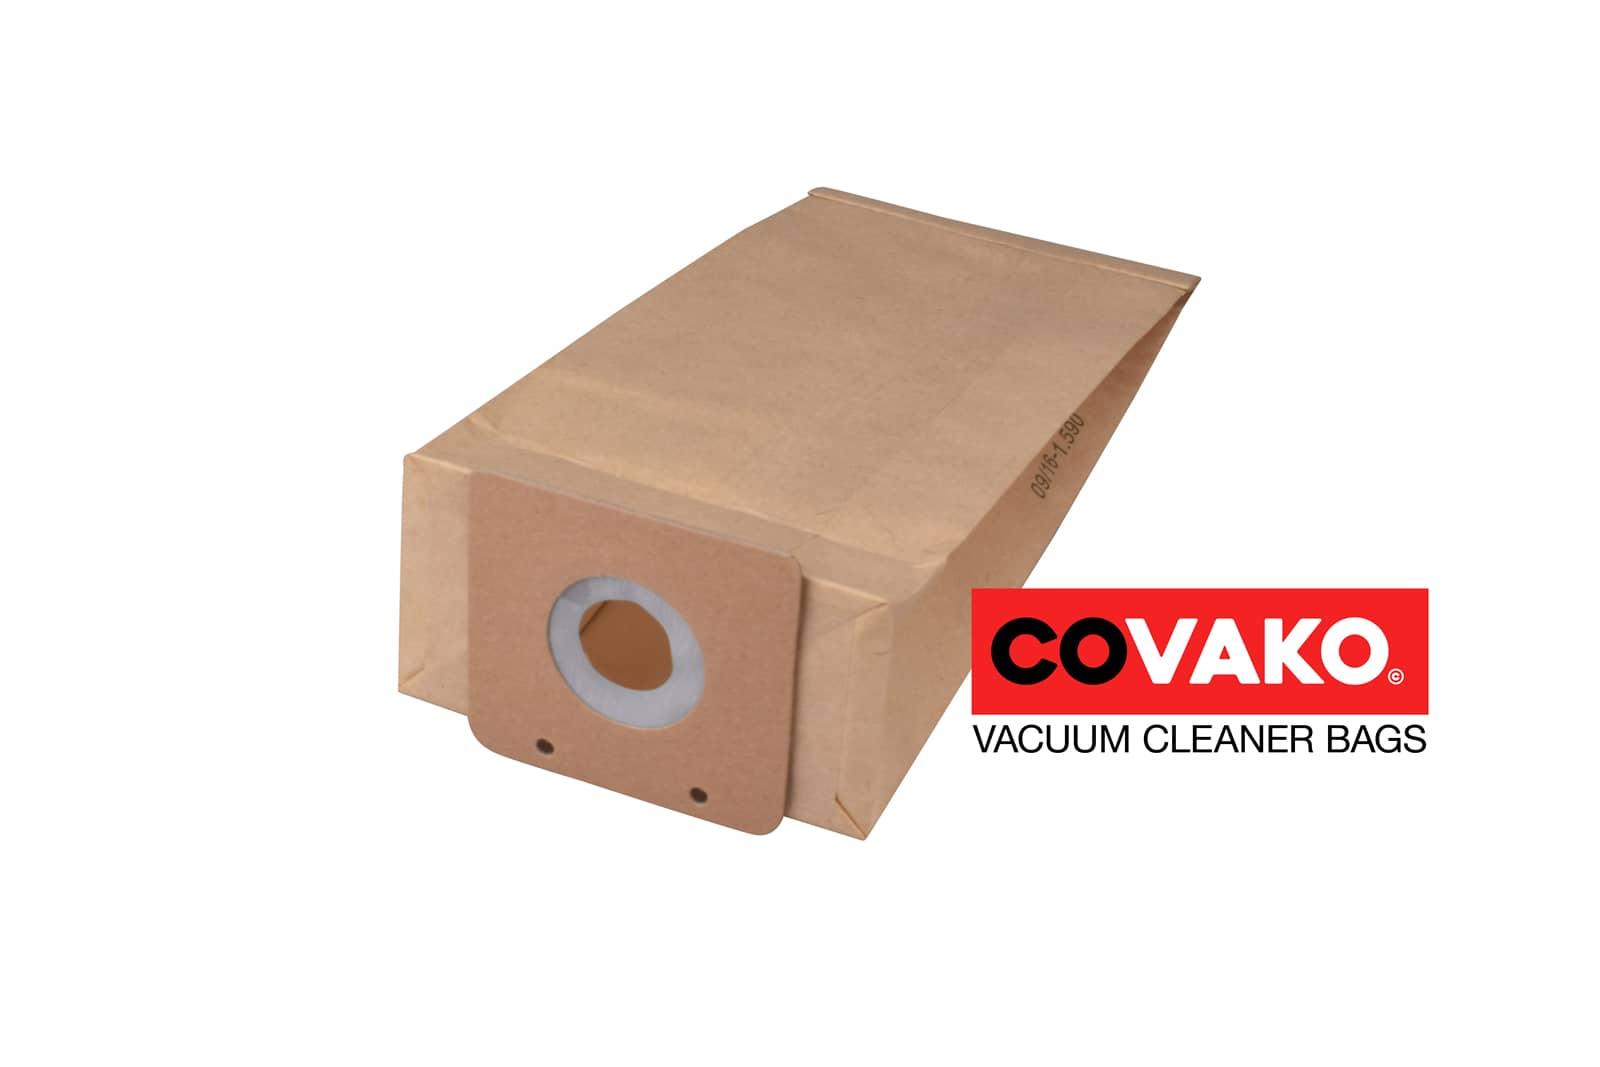 Kärcher BV 5/1 / Papier - Kärcher sacs d'aspirateur